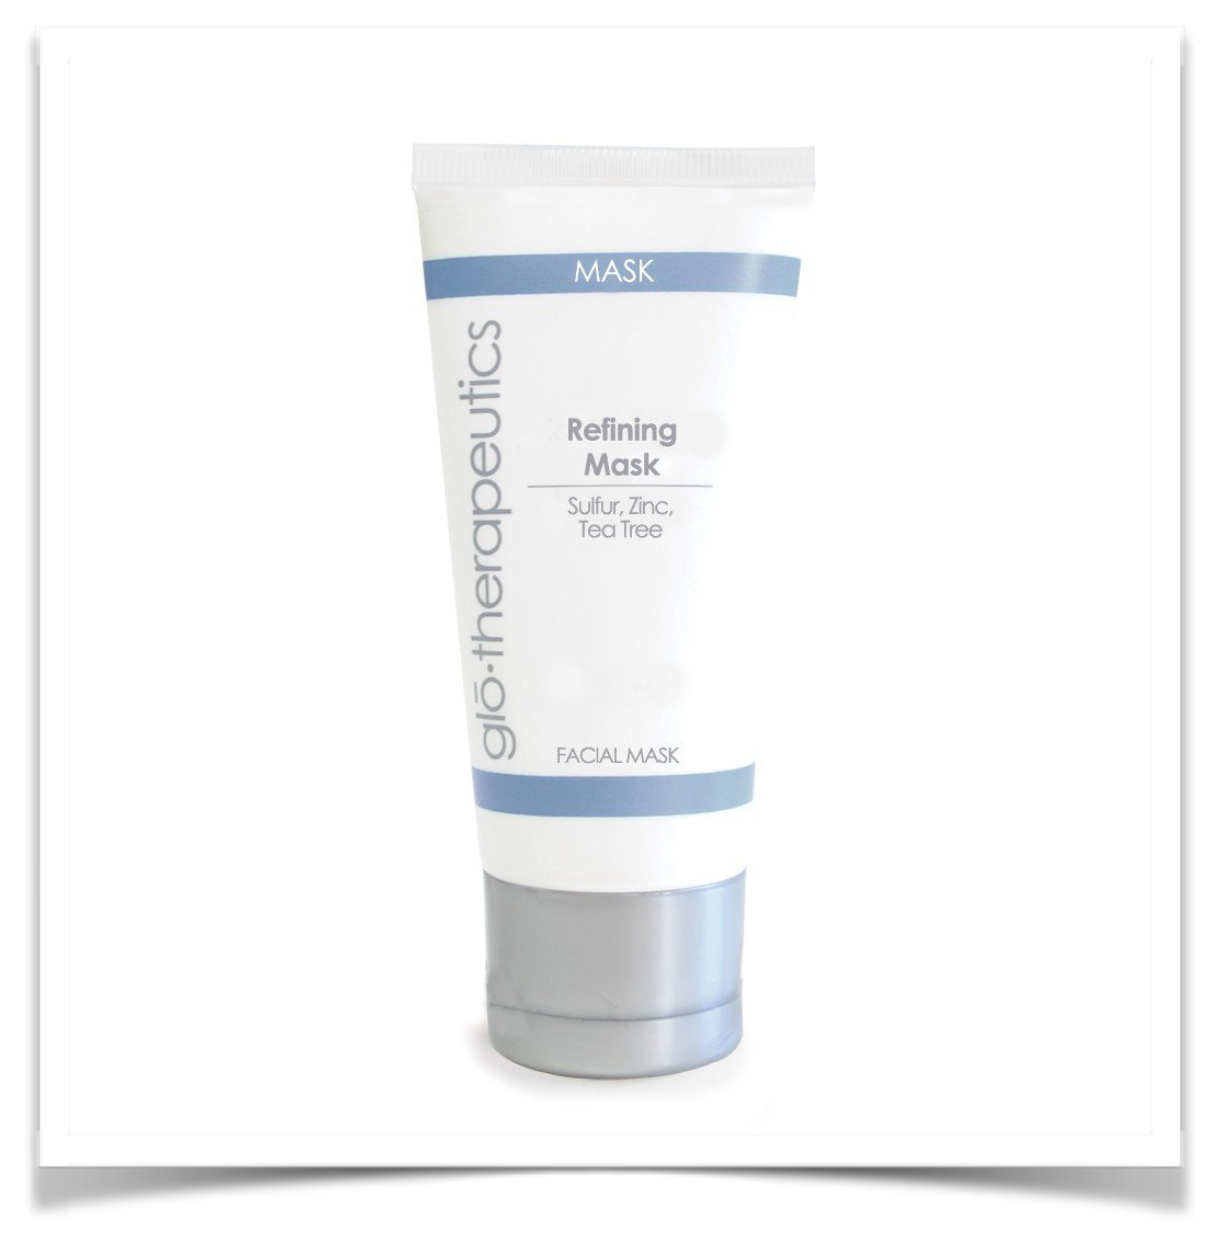 Glo-therapeutics Refining Mask